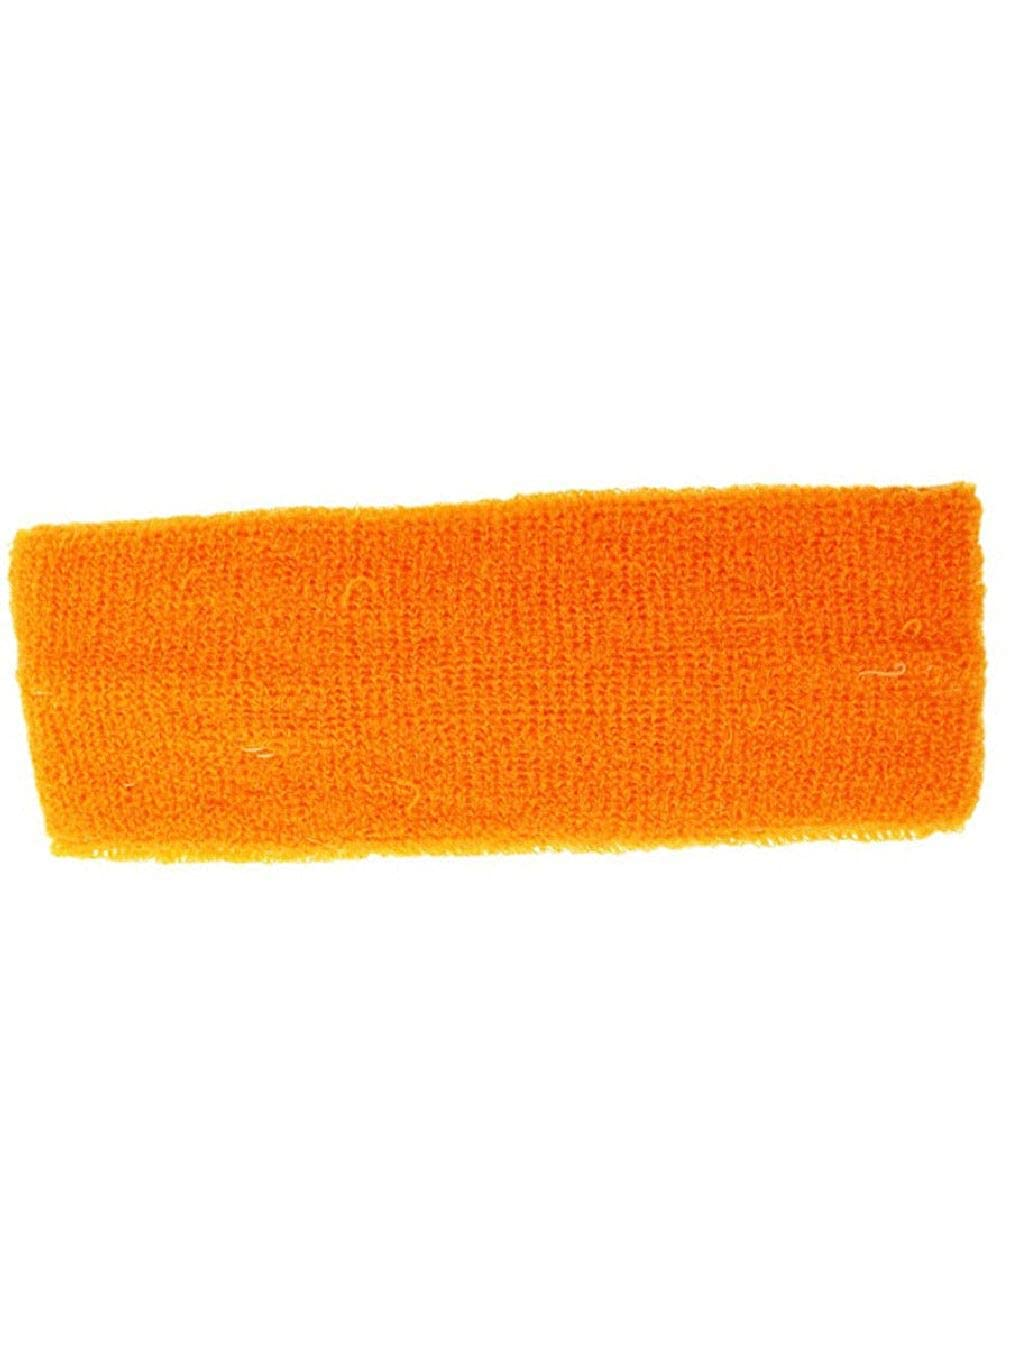 Amazon.com  Orange Cute Stylish Hair Headbands Head Band Costume Accessory   Clothing 2022d599fbe